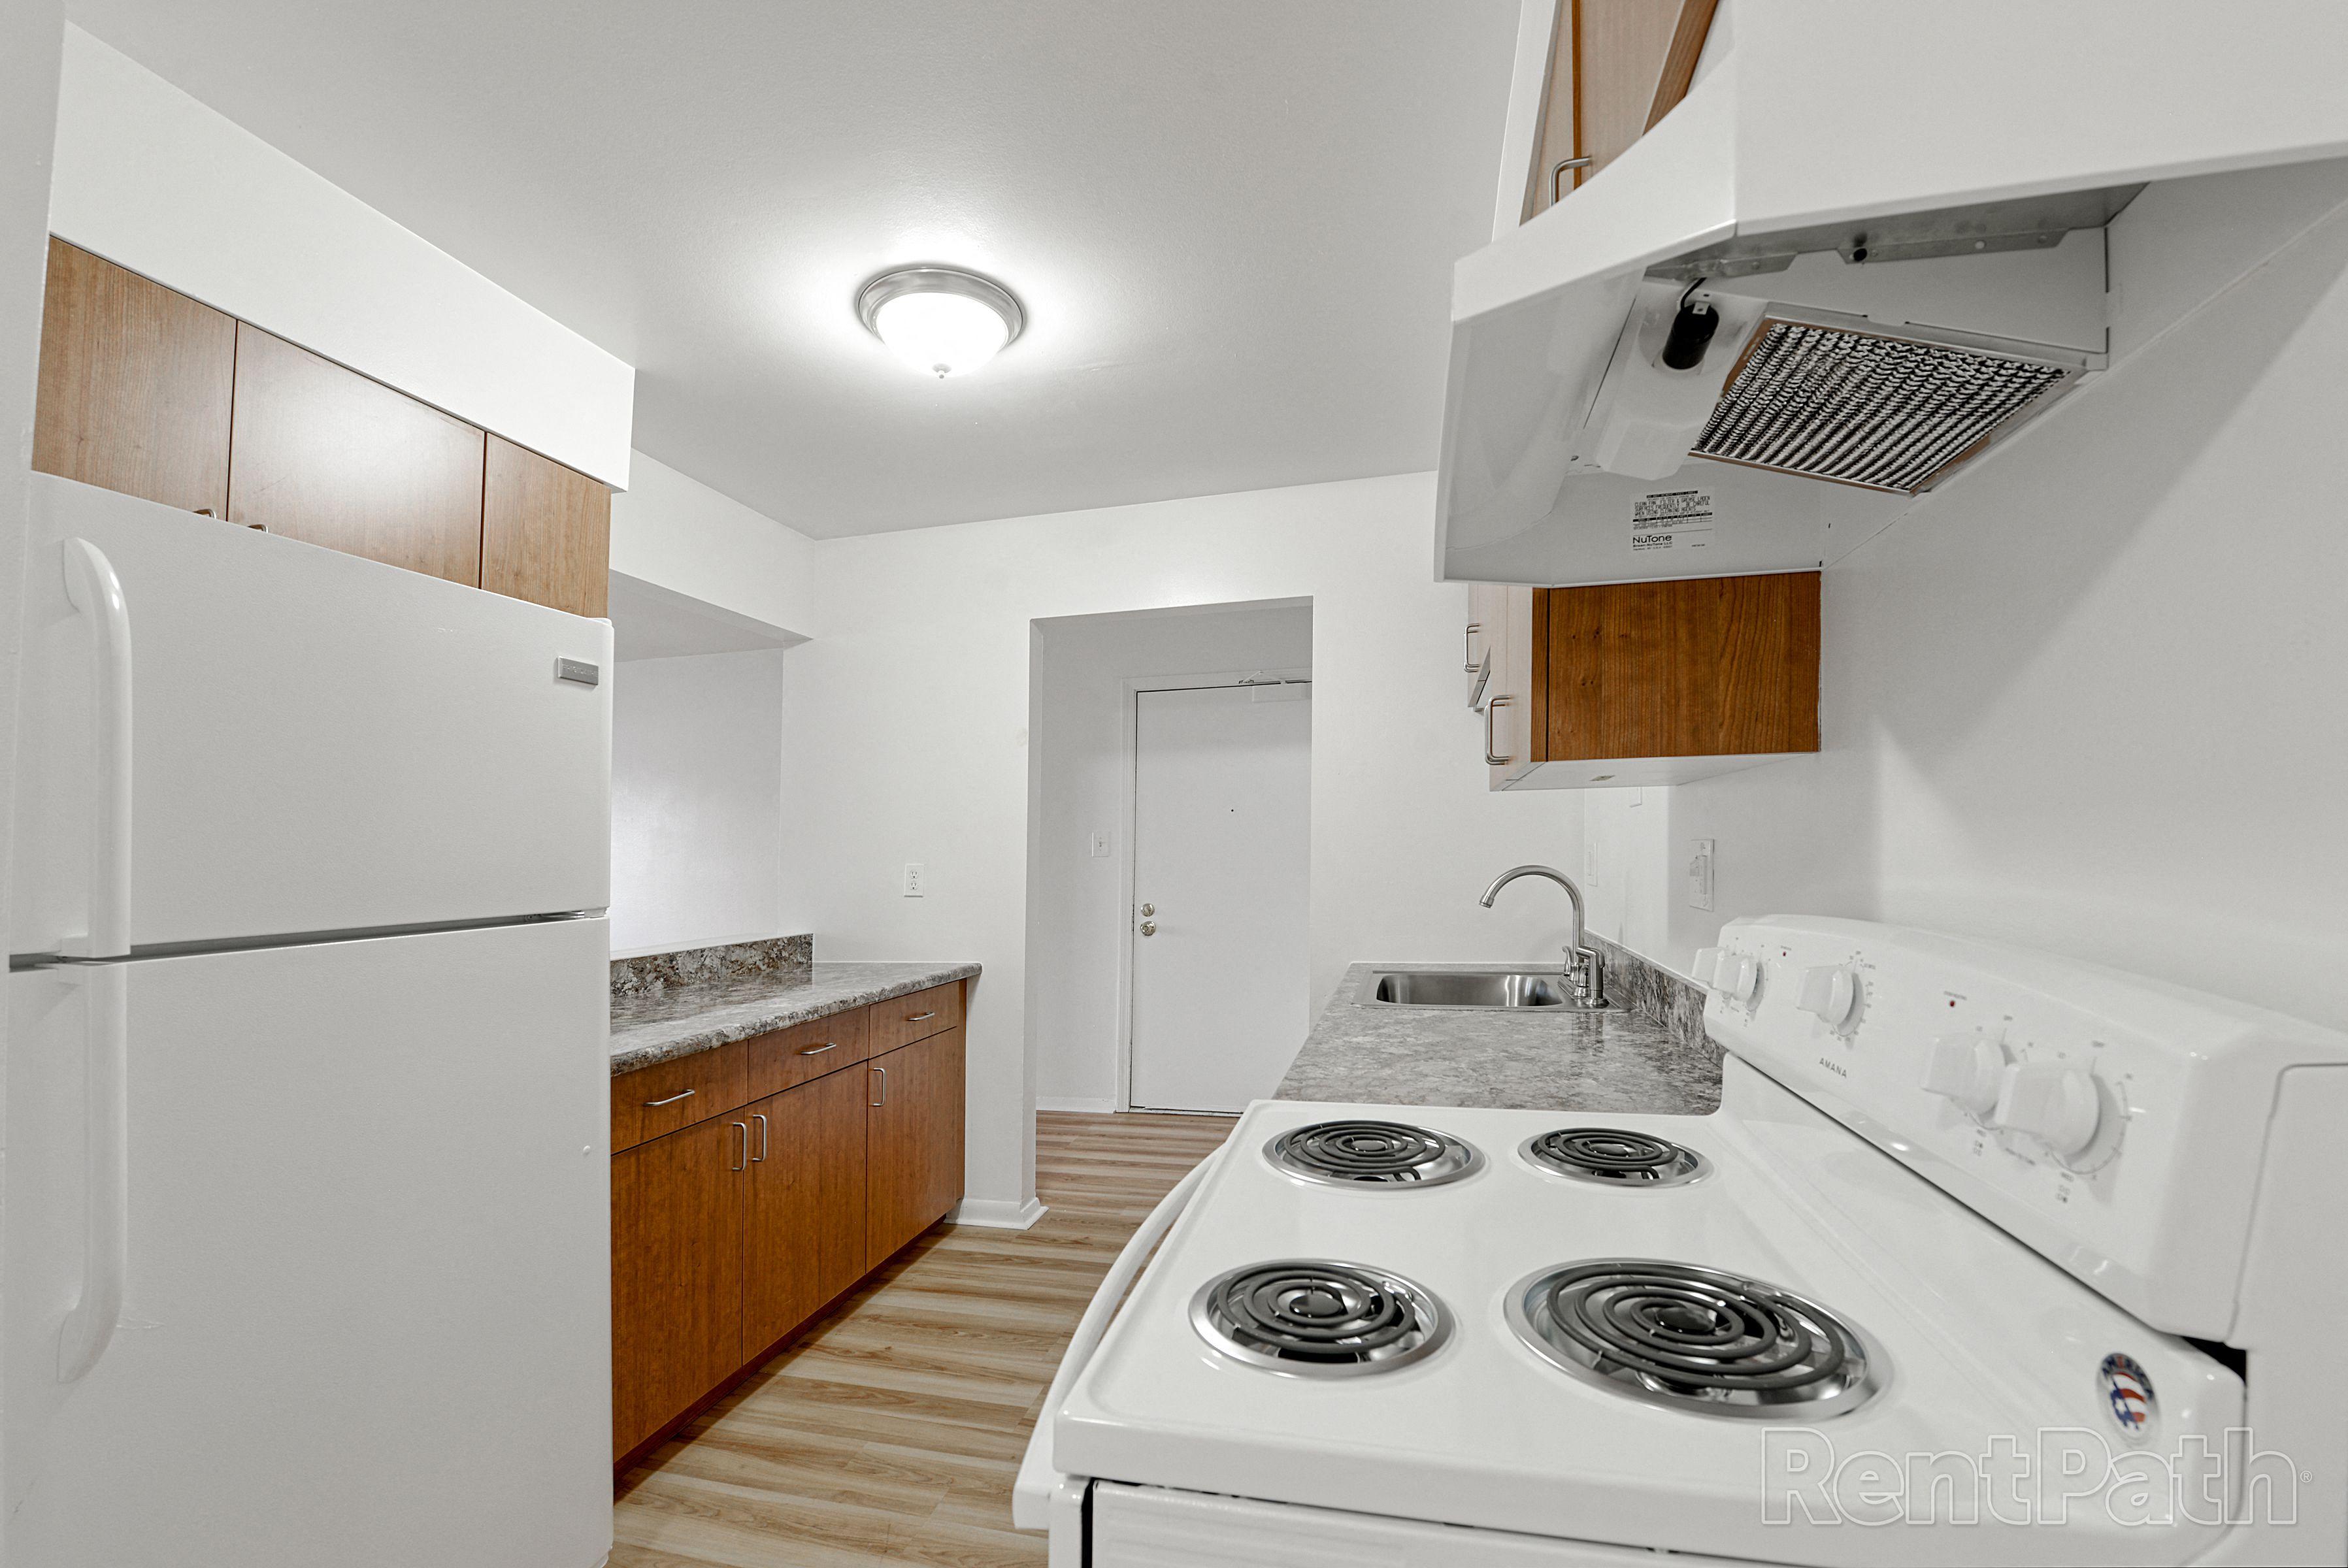 Tiberon Trails 2 Bedroom 1 Bath Kitchen